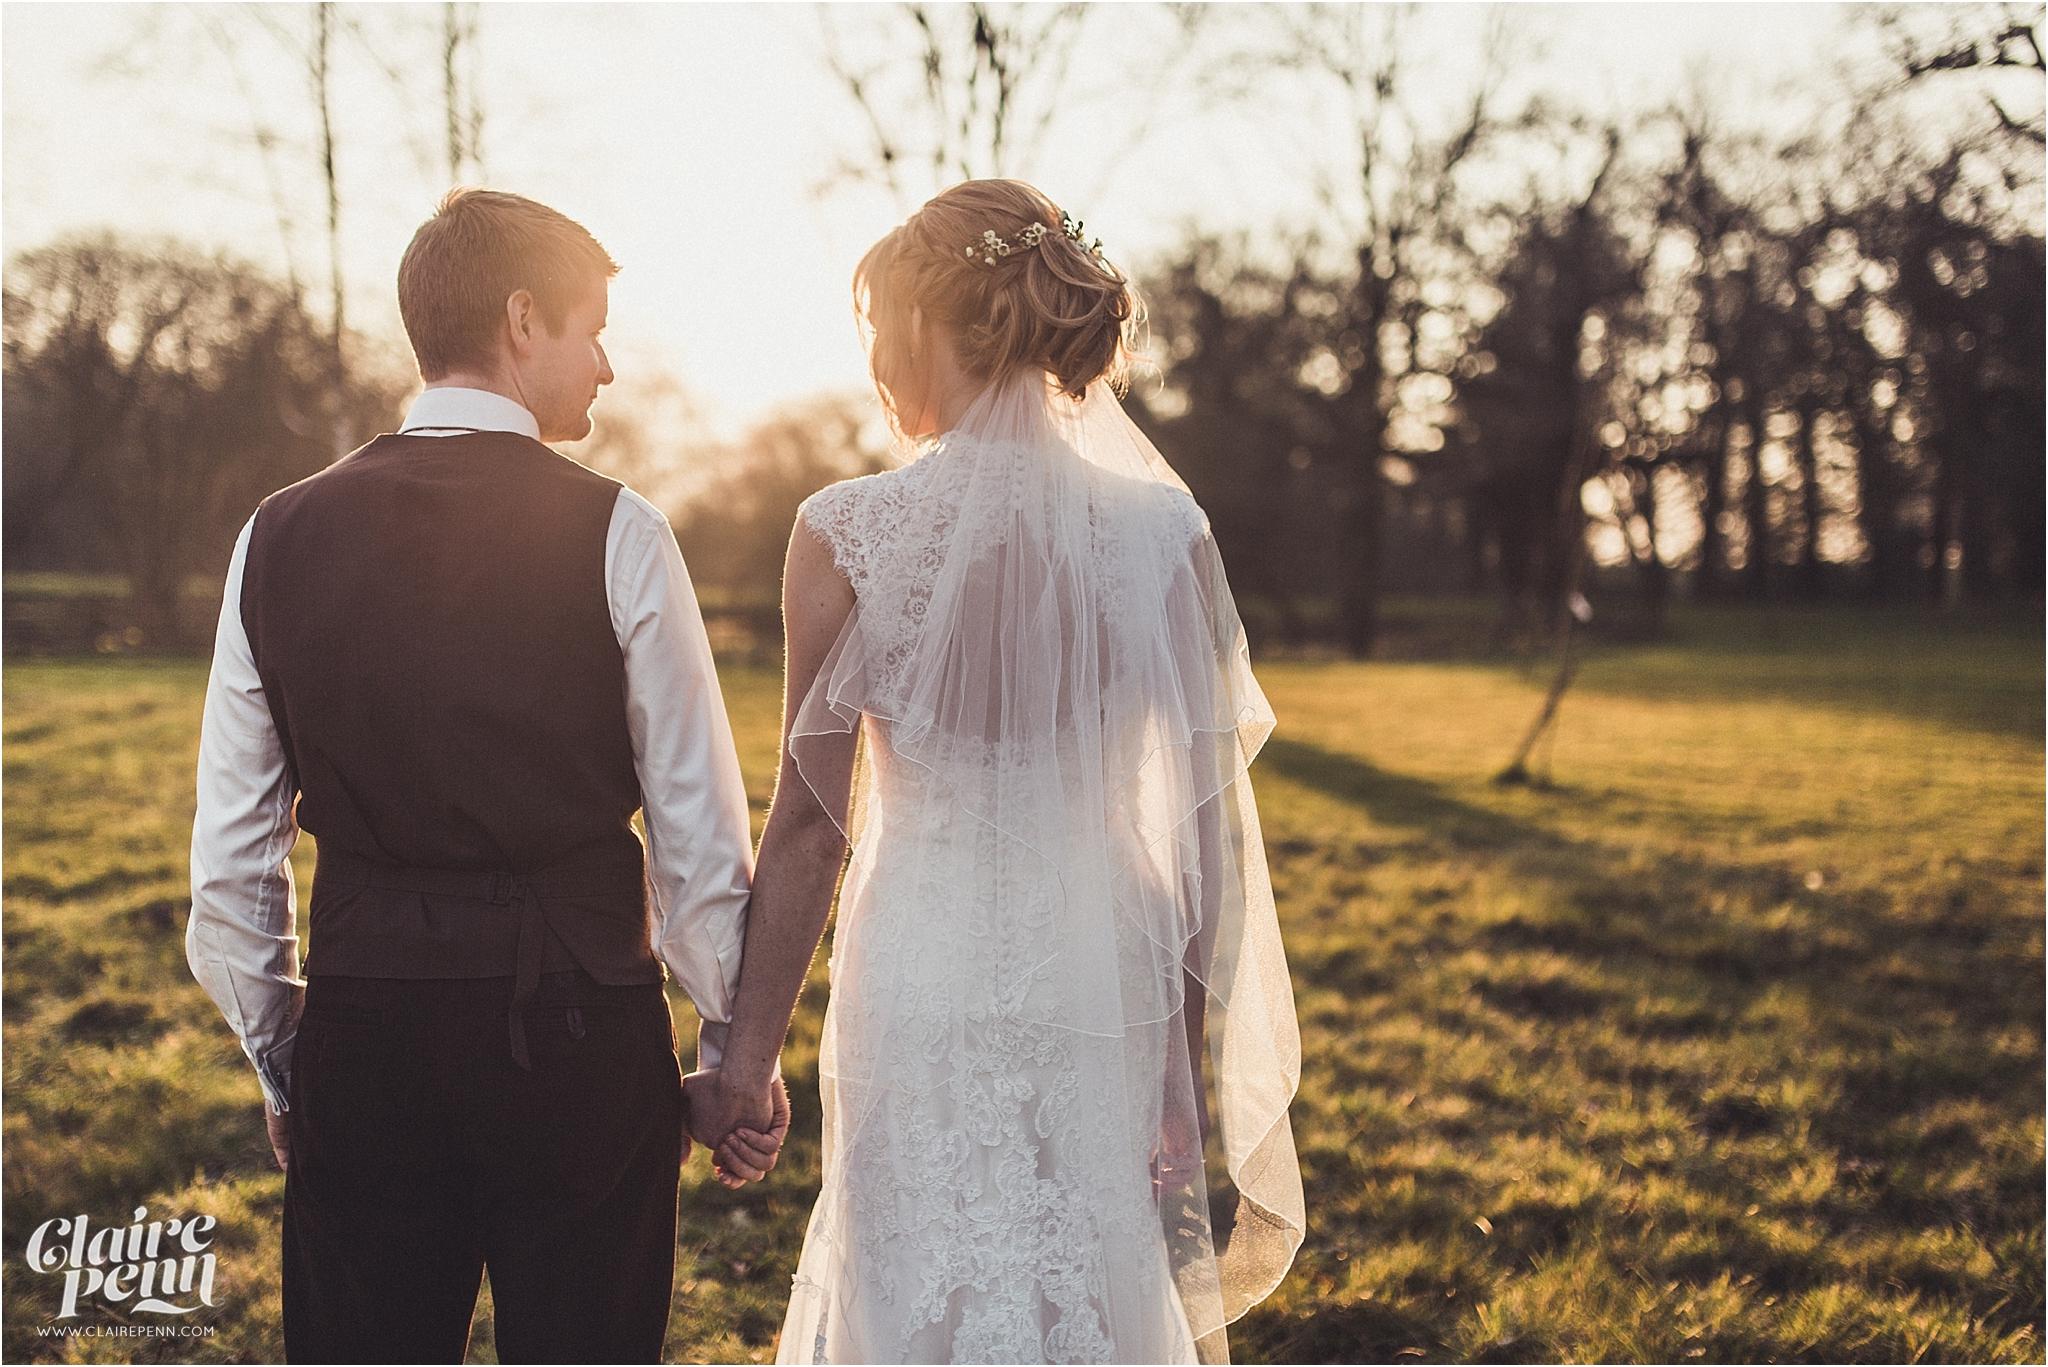 Iscoyd Park wedding, Whitchurch, Cheshire wedding photographer_0052.jpg